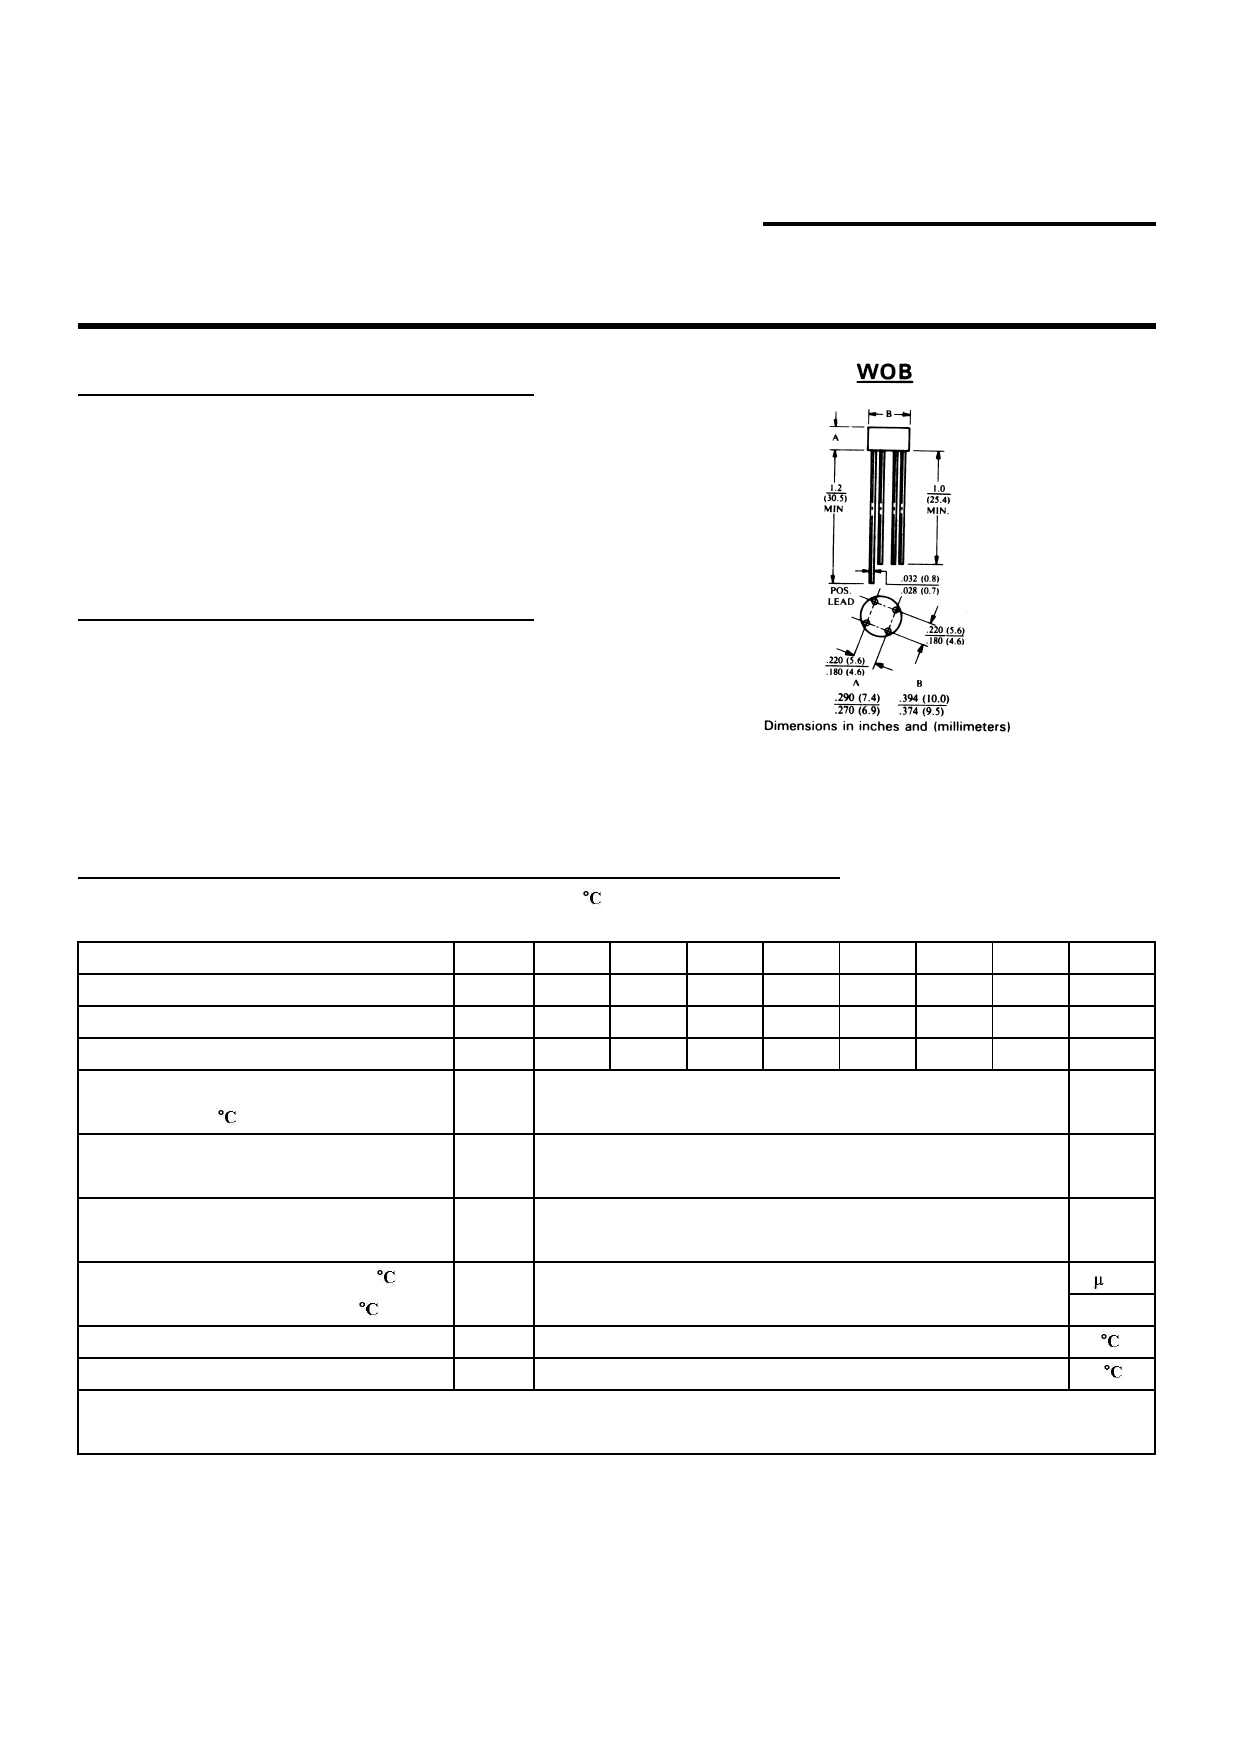 W01 datasheet